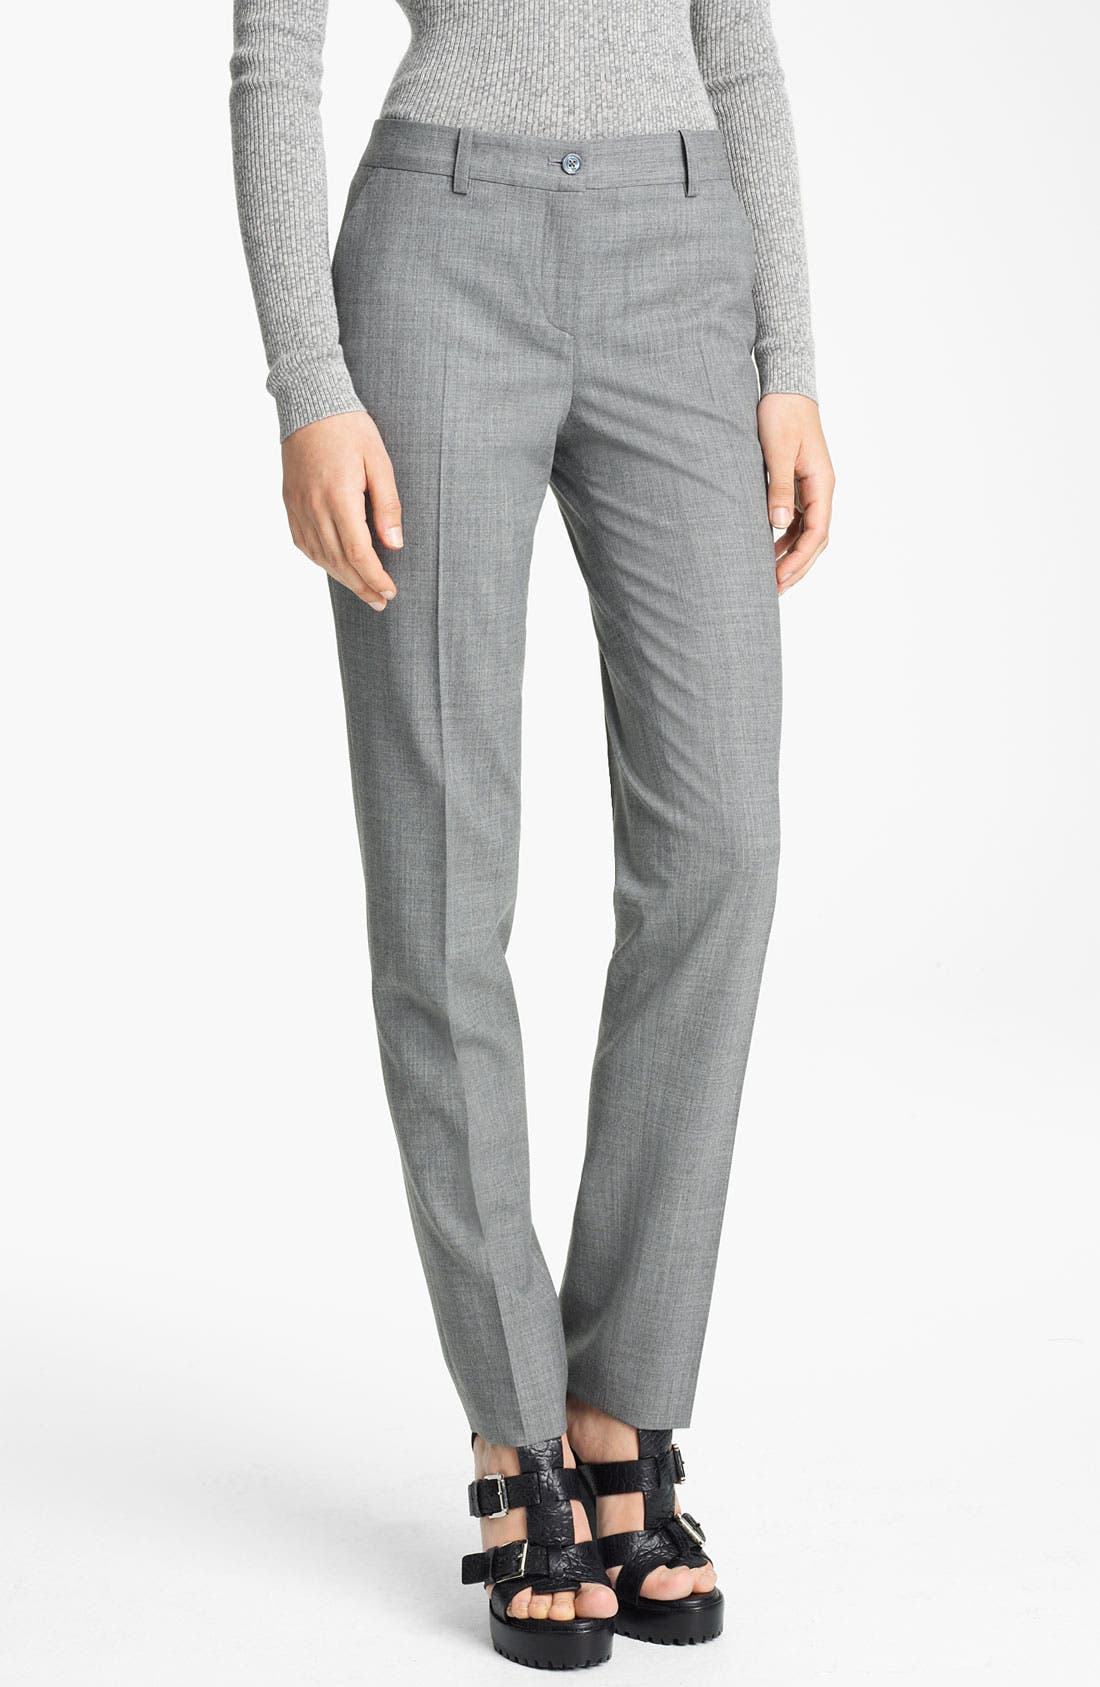 Main Image - Michael Kors 'Samantha' Skinny Tropical Wool Pants